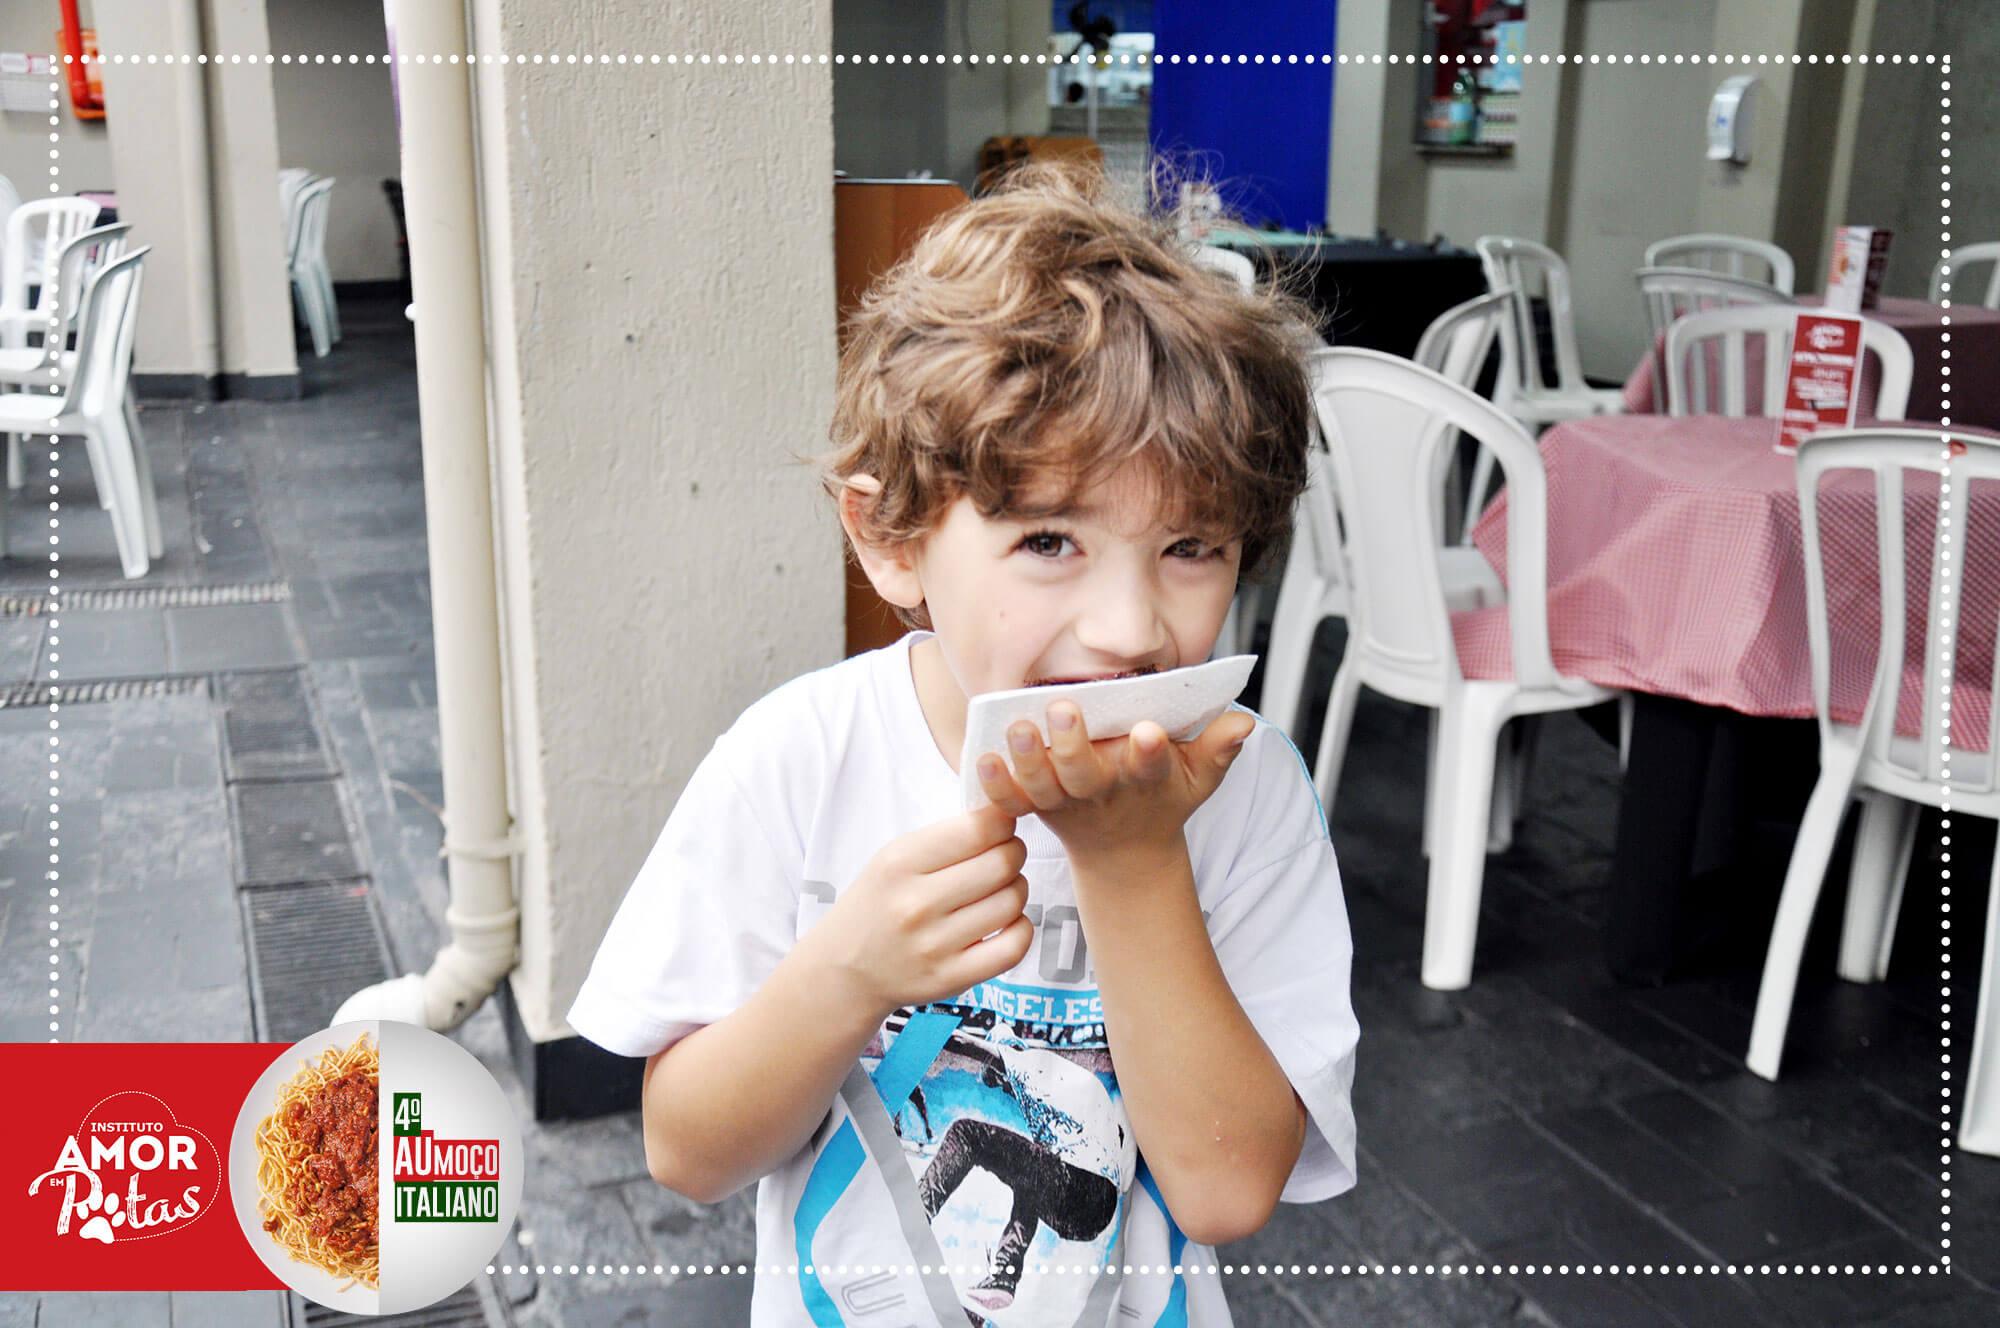 4aumoco-italiano-amor-em-patas-famesp